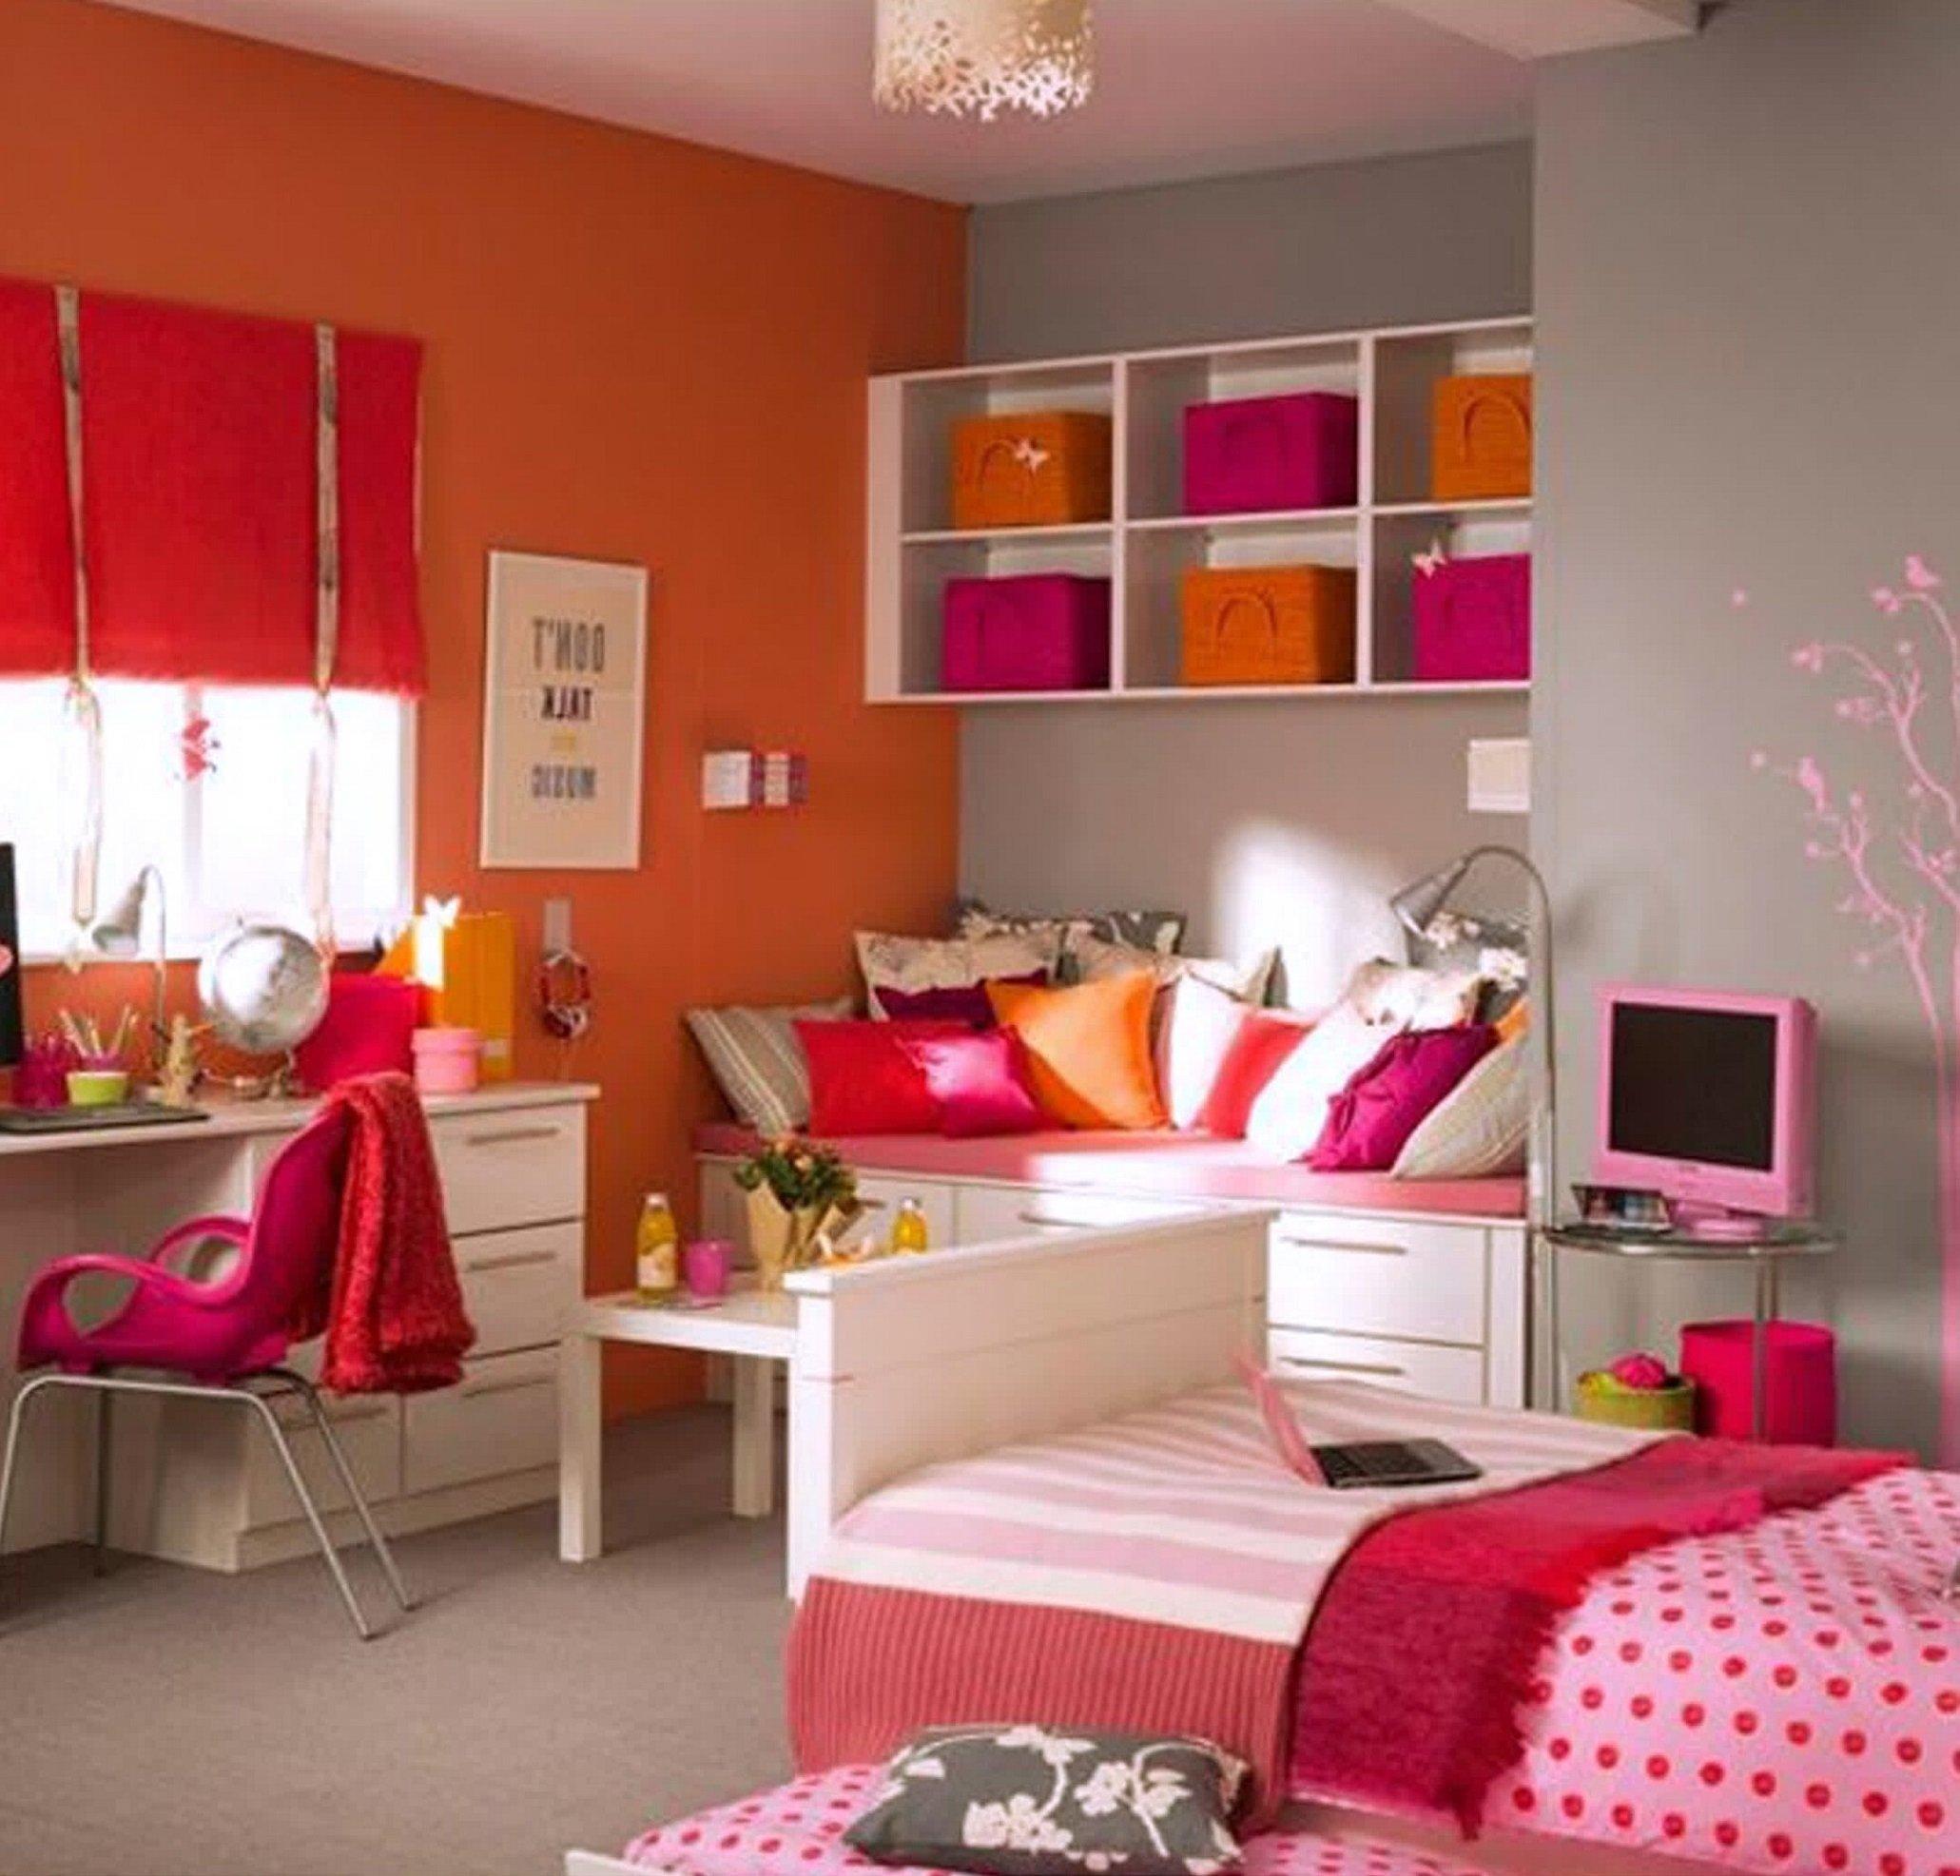 10 Stylish Small Bedroom Ideas For Girls bedroom teenage bedroom makeover ideas teen furniture ideas small 2020